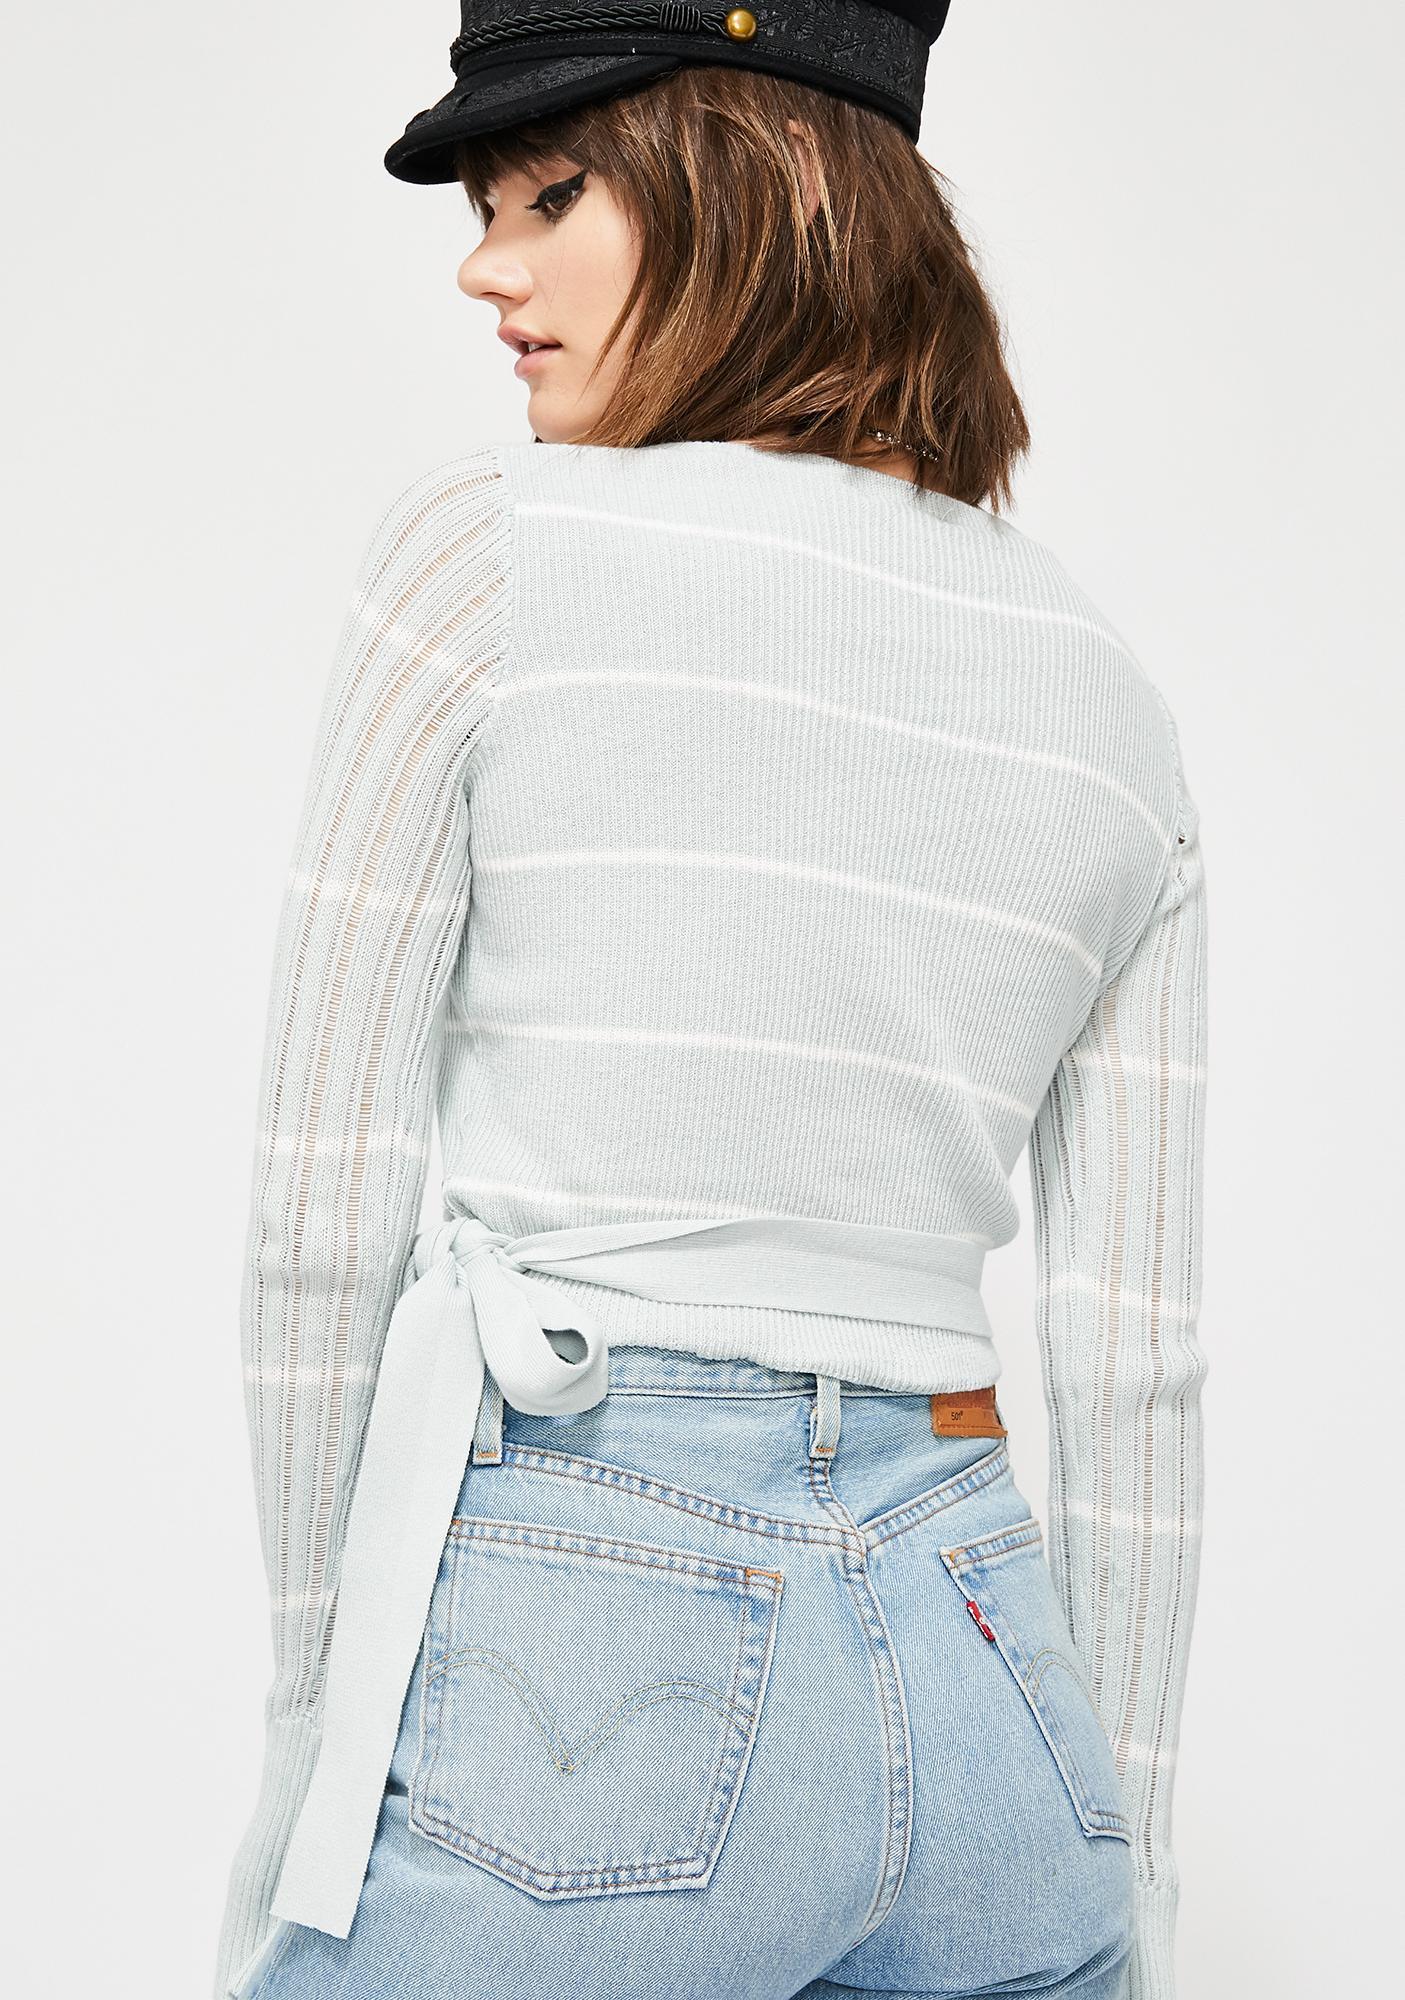 Dream On Wrap Sweater